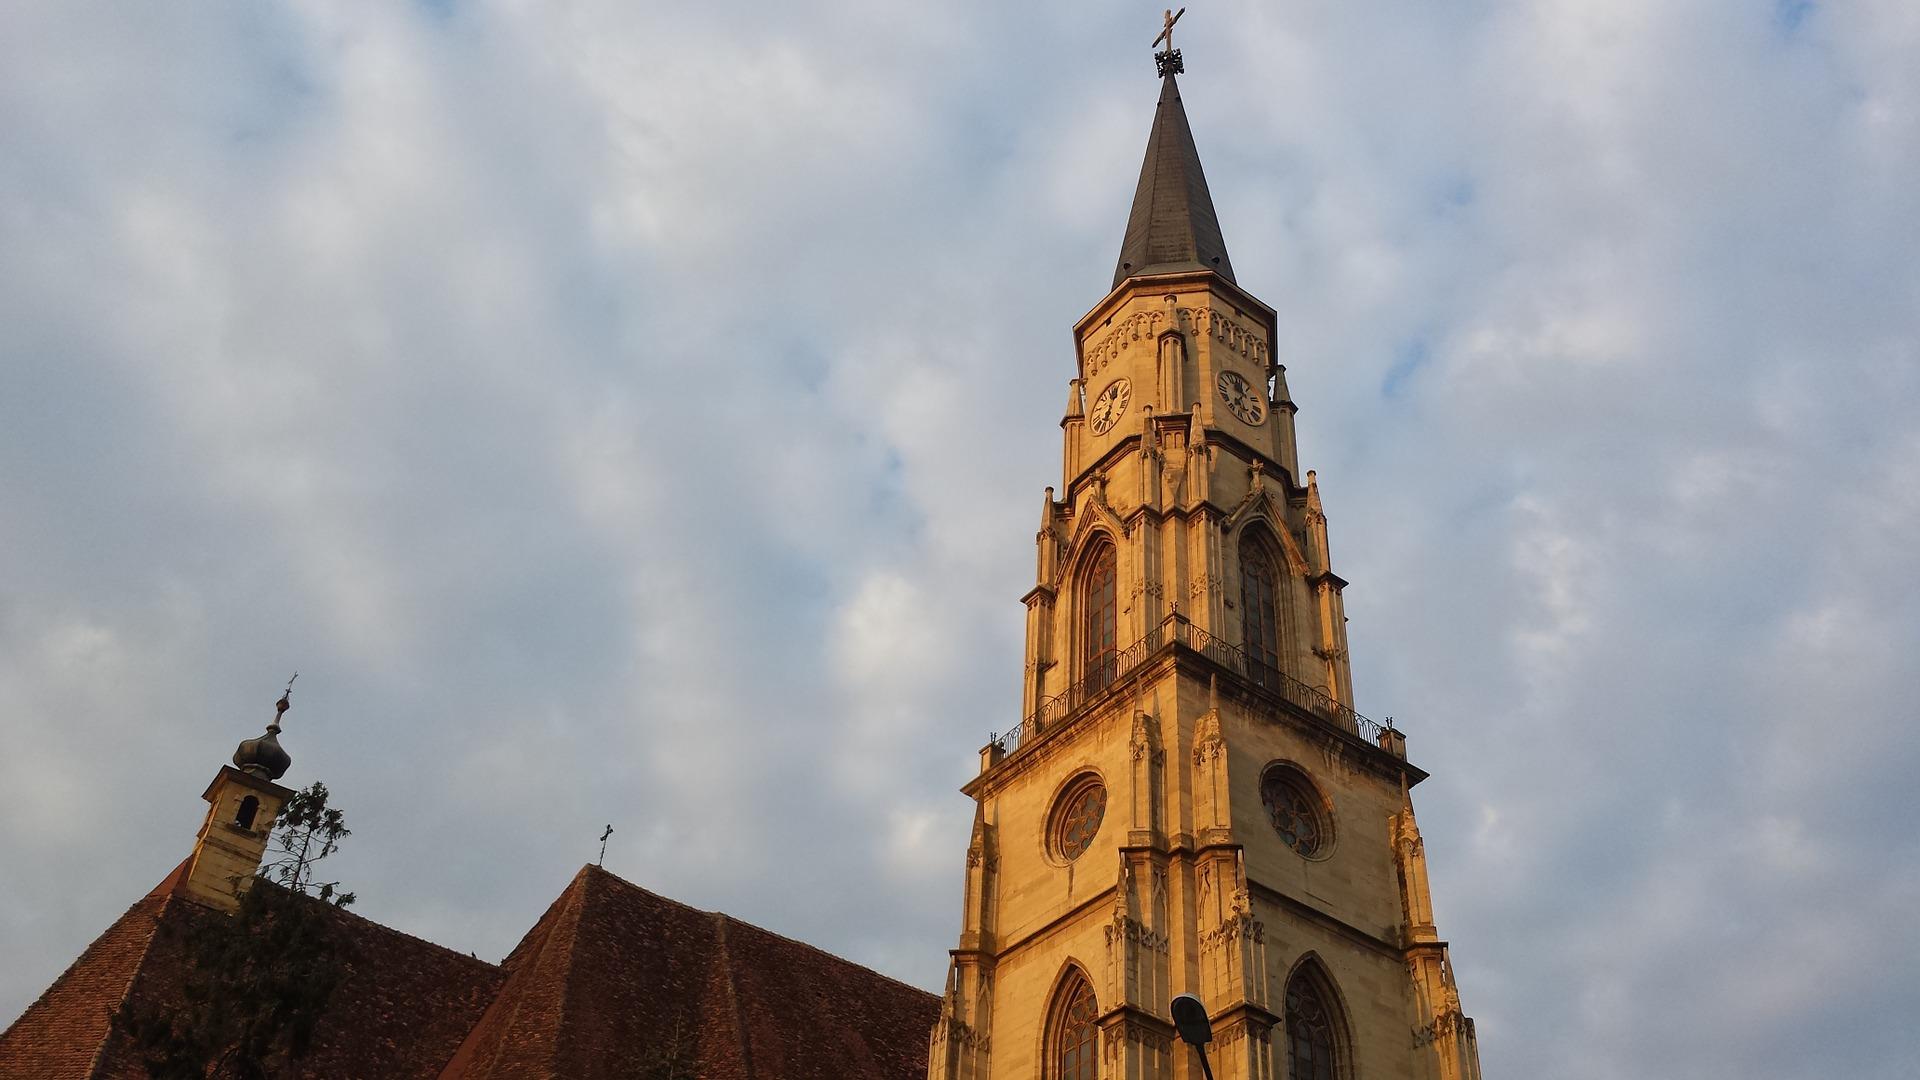 church-773229_1920.jpg